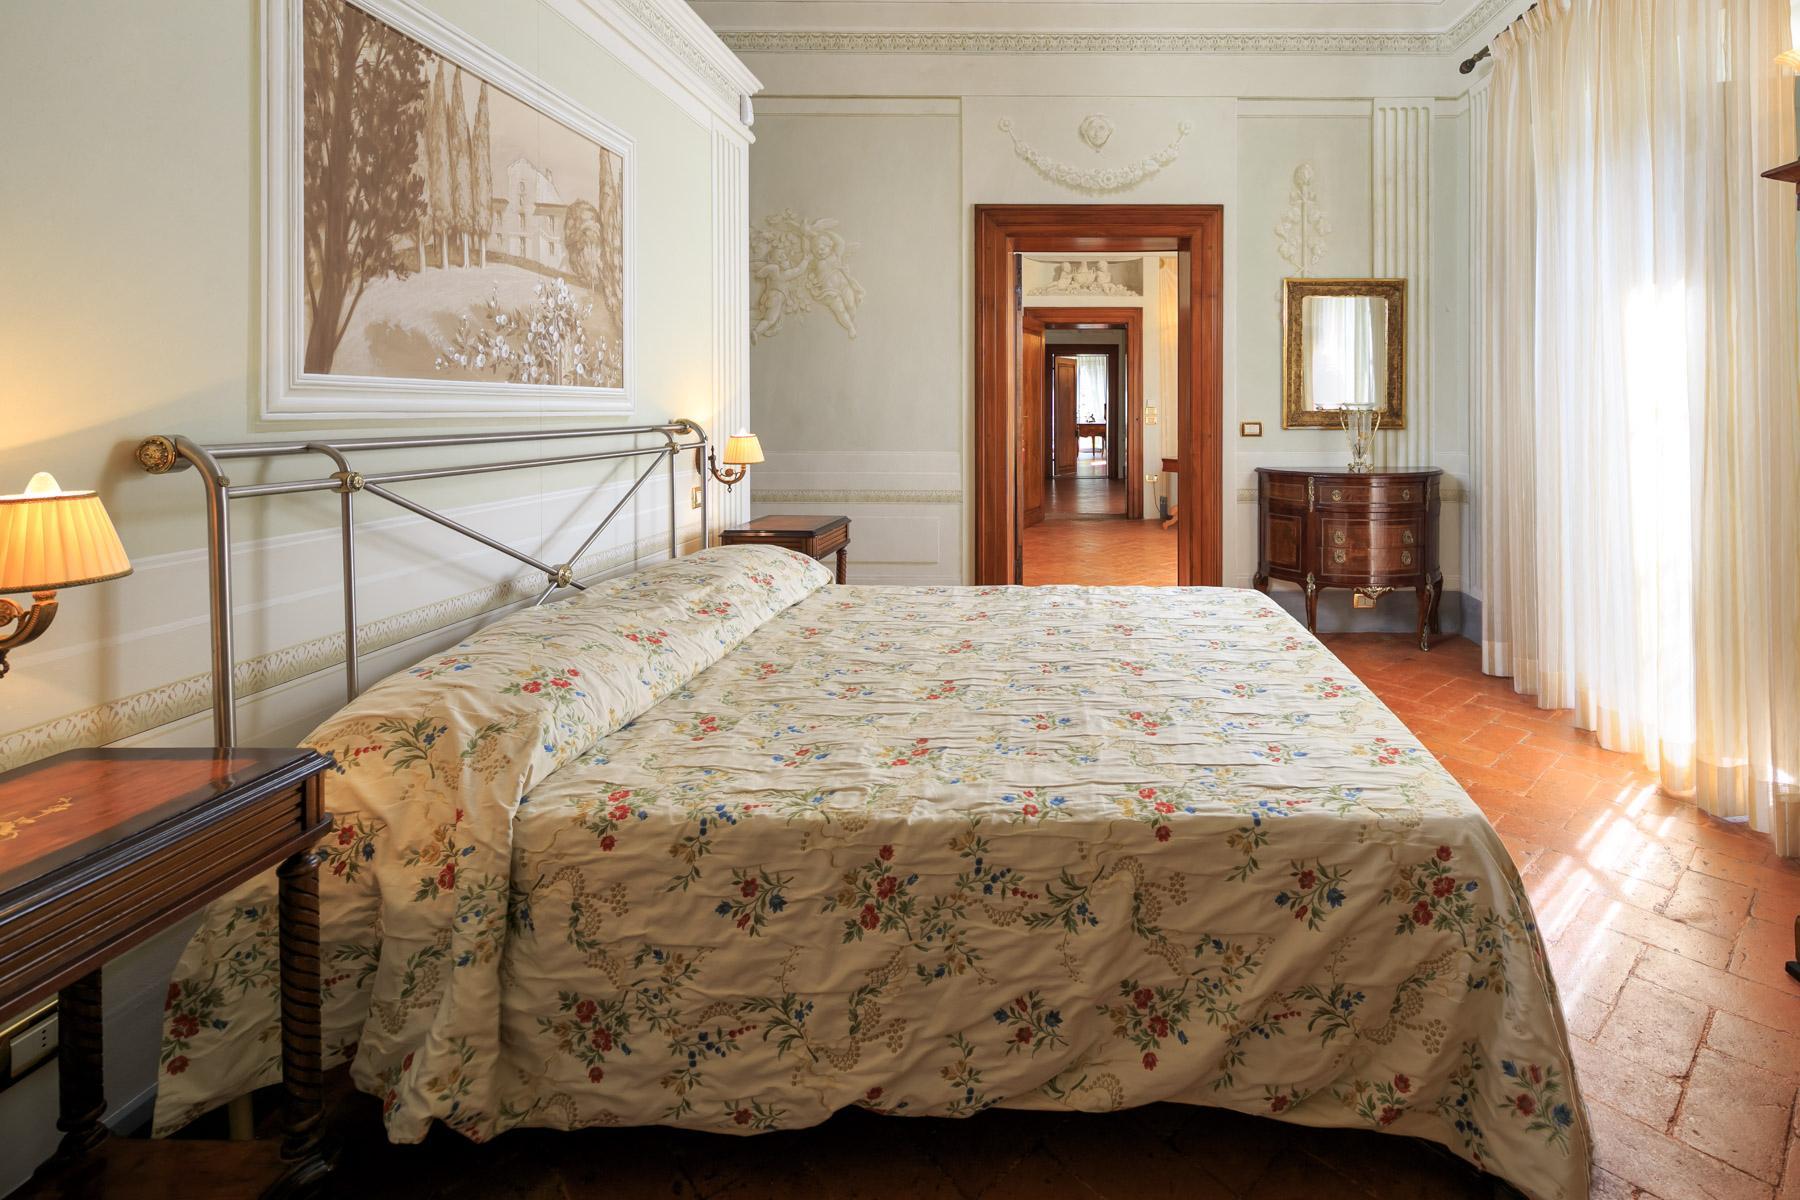 Exquisite 16th century property - 12